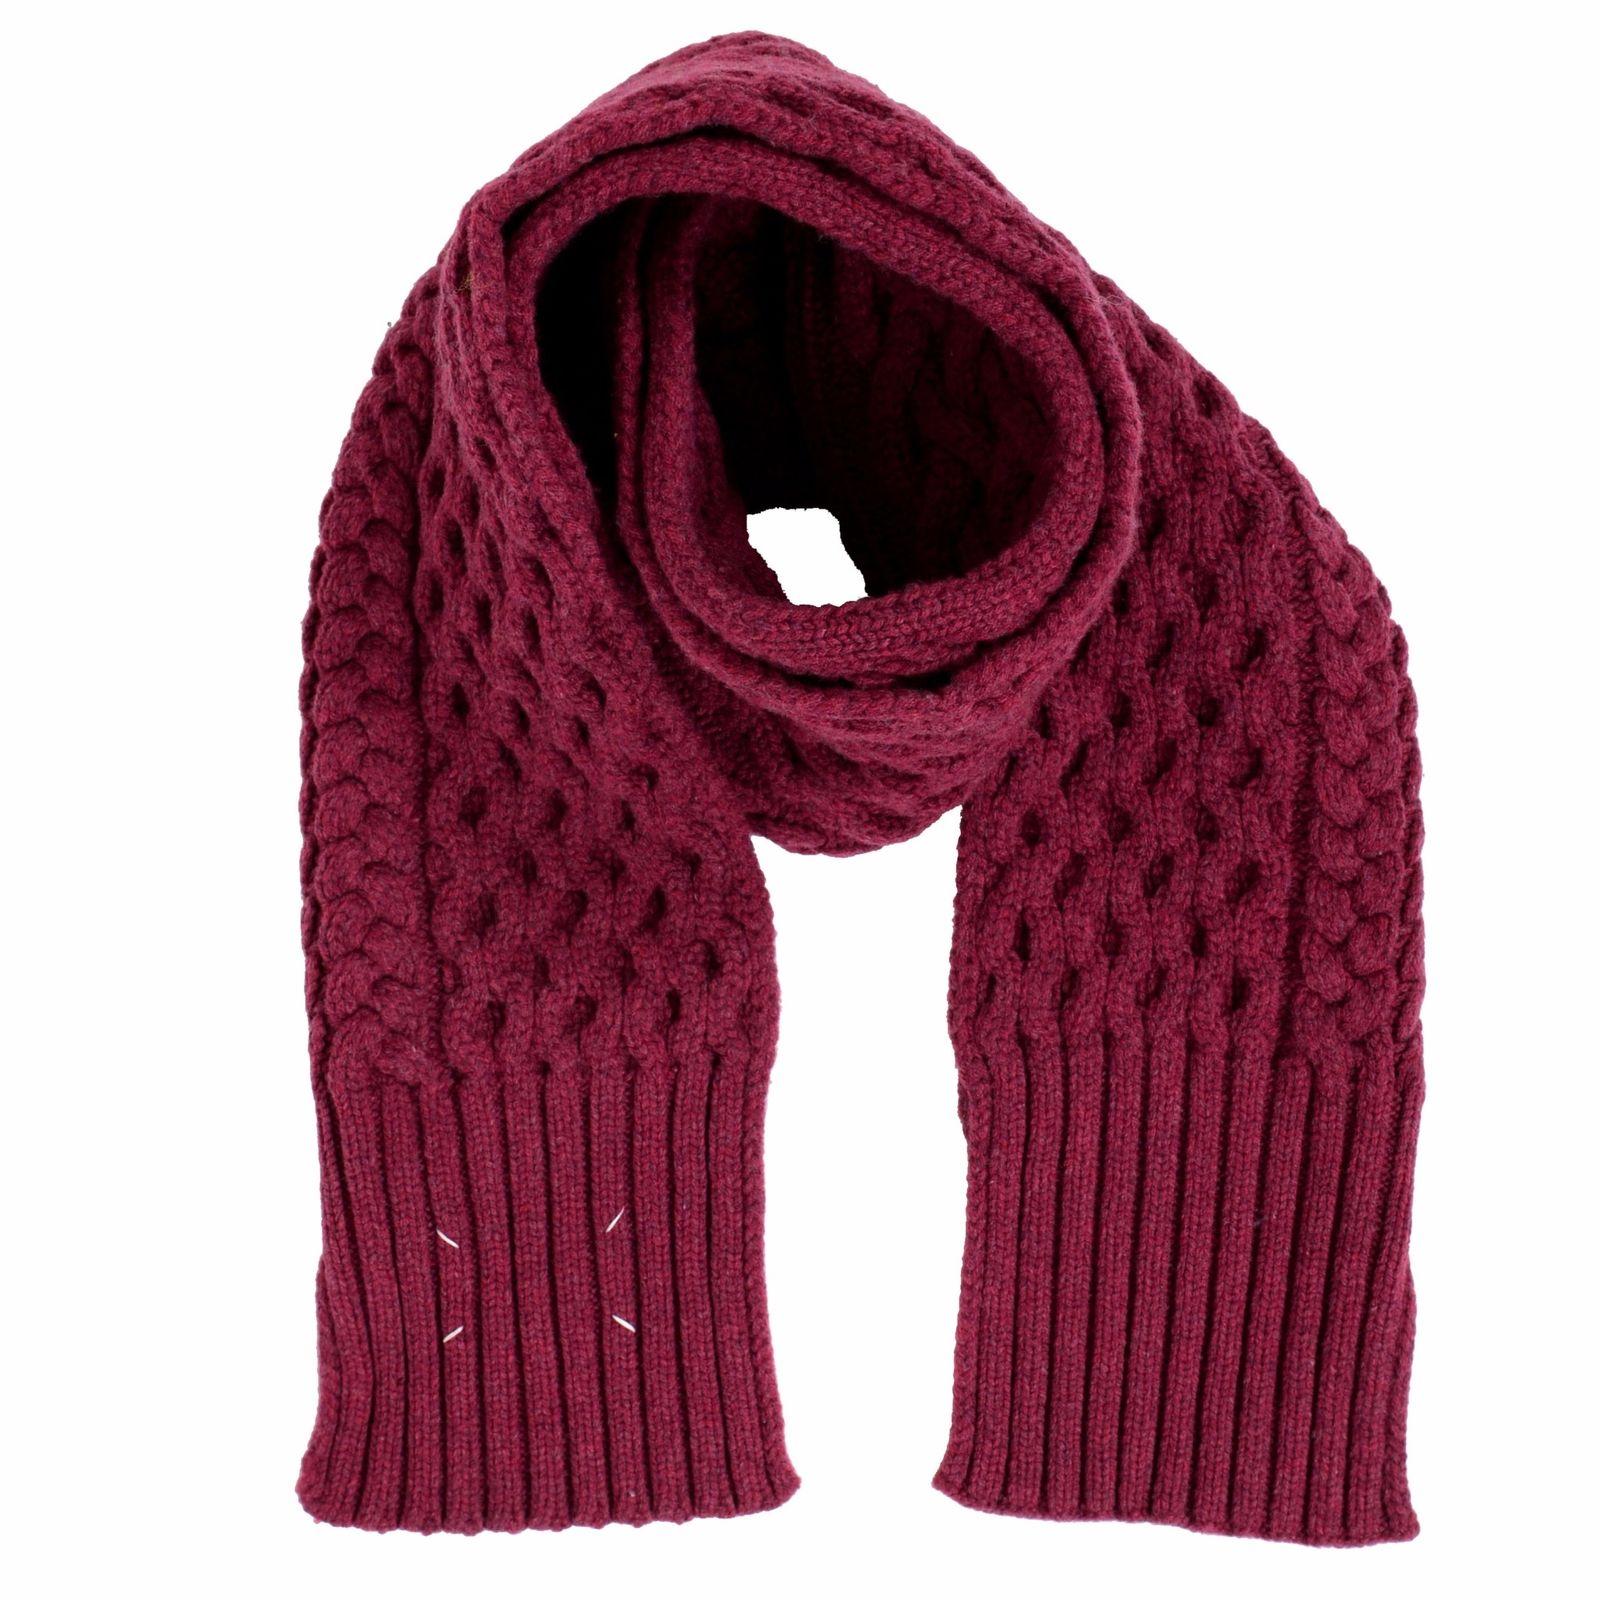 ONE MODA  Maison Margiela 1 100% Wool Burgundy Heavy Knitted Women s ... a793f32ee